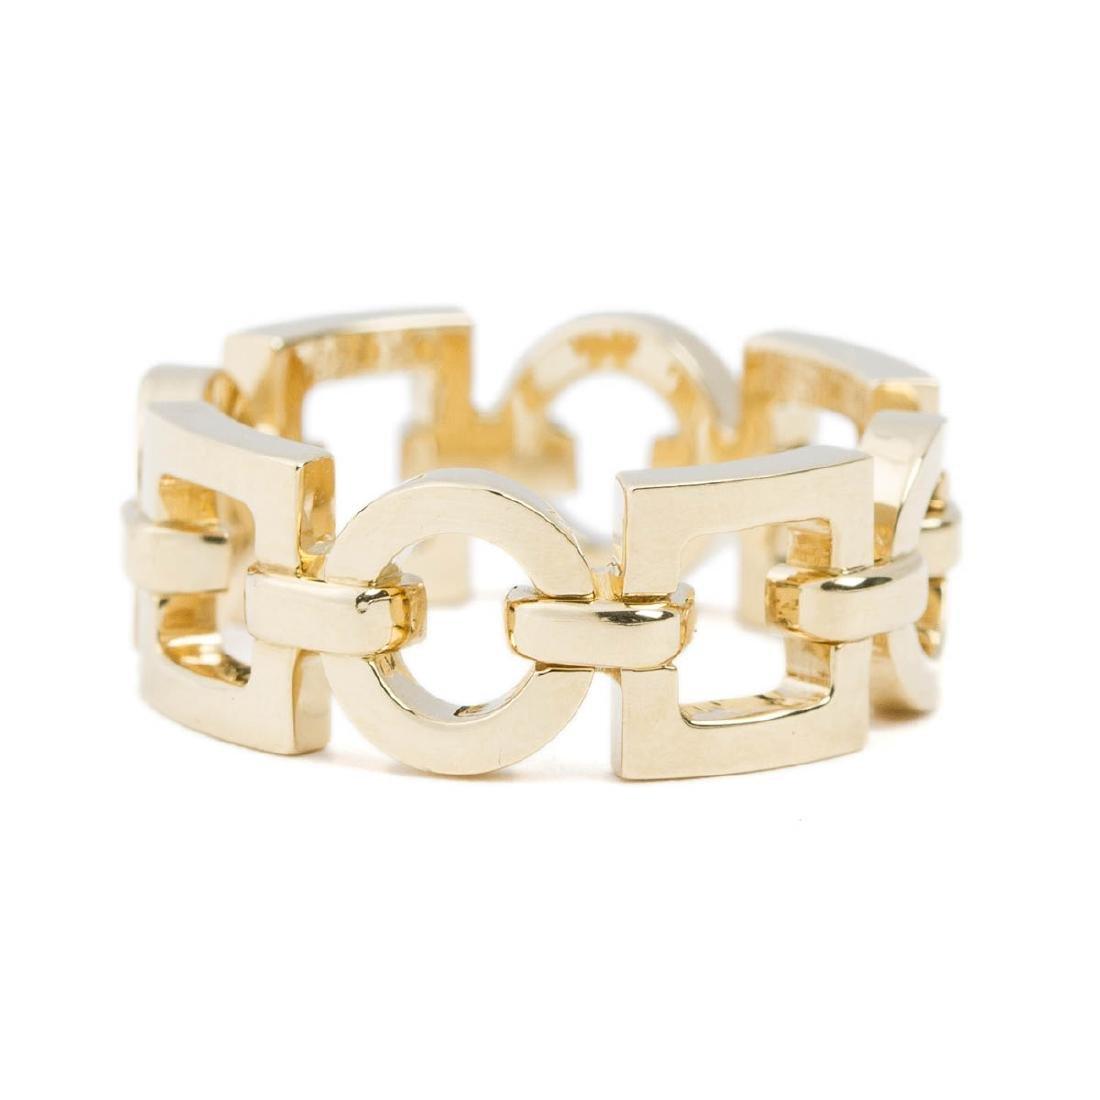 Boucheron Square and Circle Chain Ring - 4